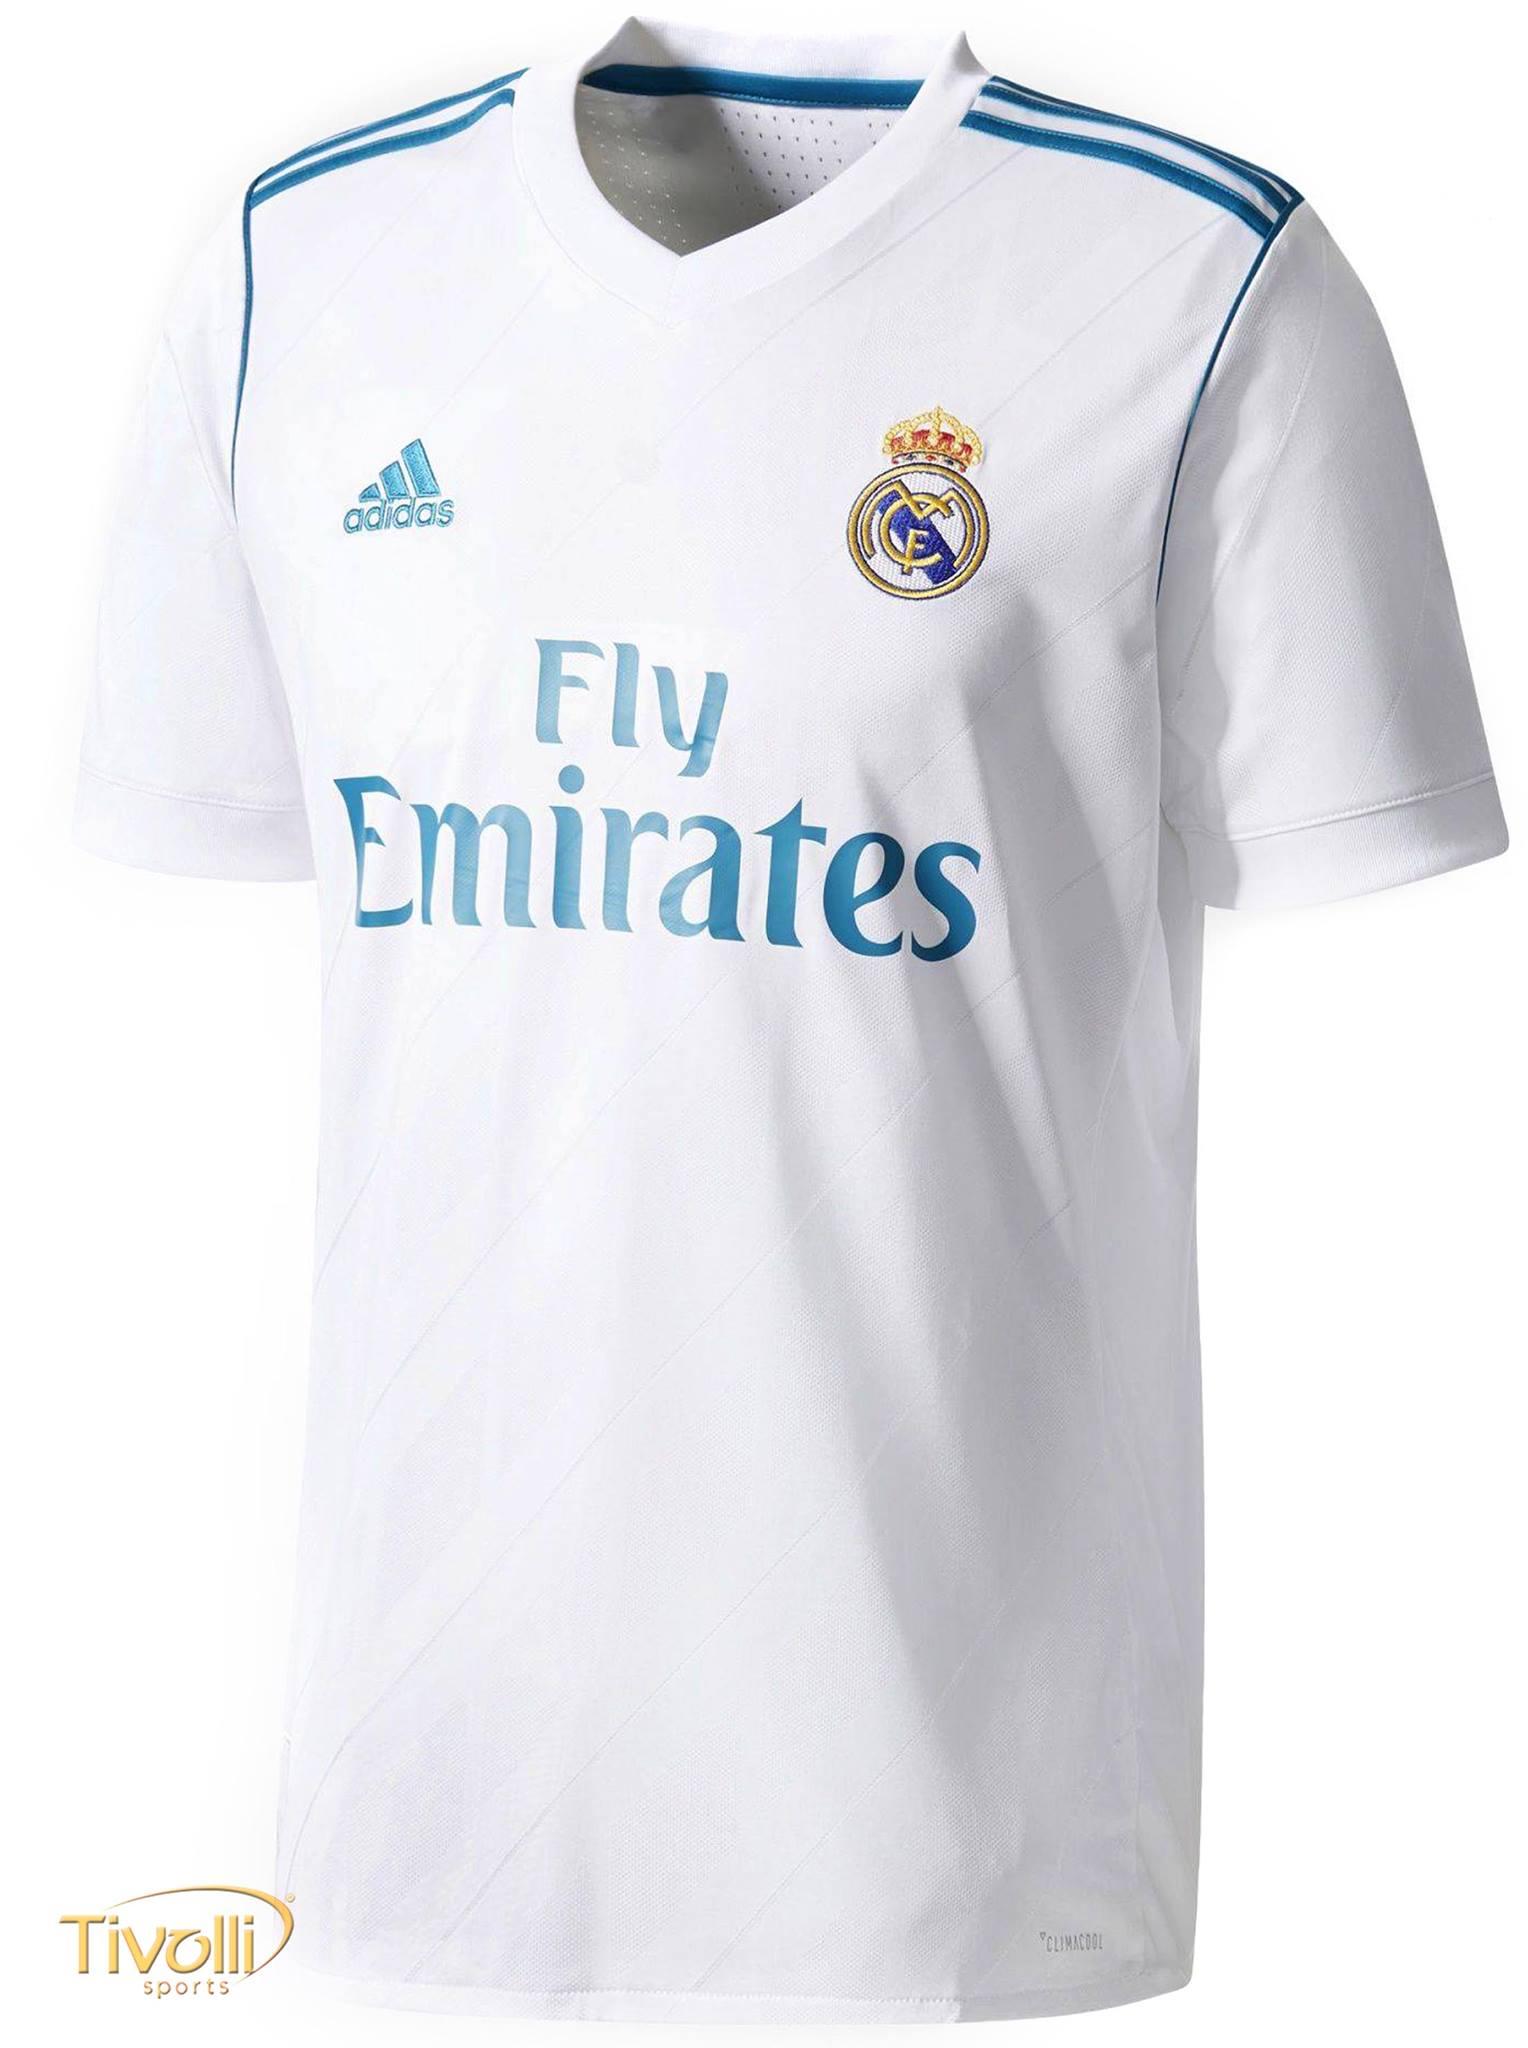 eed5eca134 Camisa Real Madrid I Home 2017 2018 Adidas Infantil   - Mega Saldão